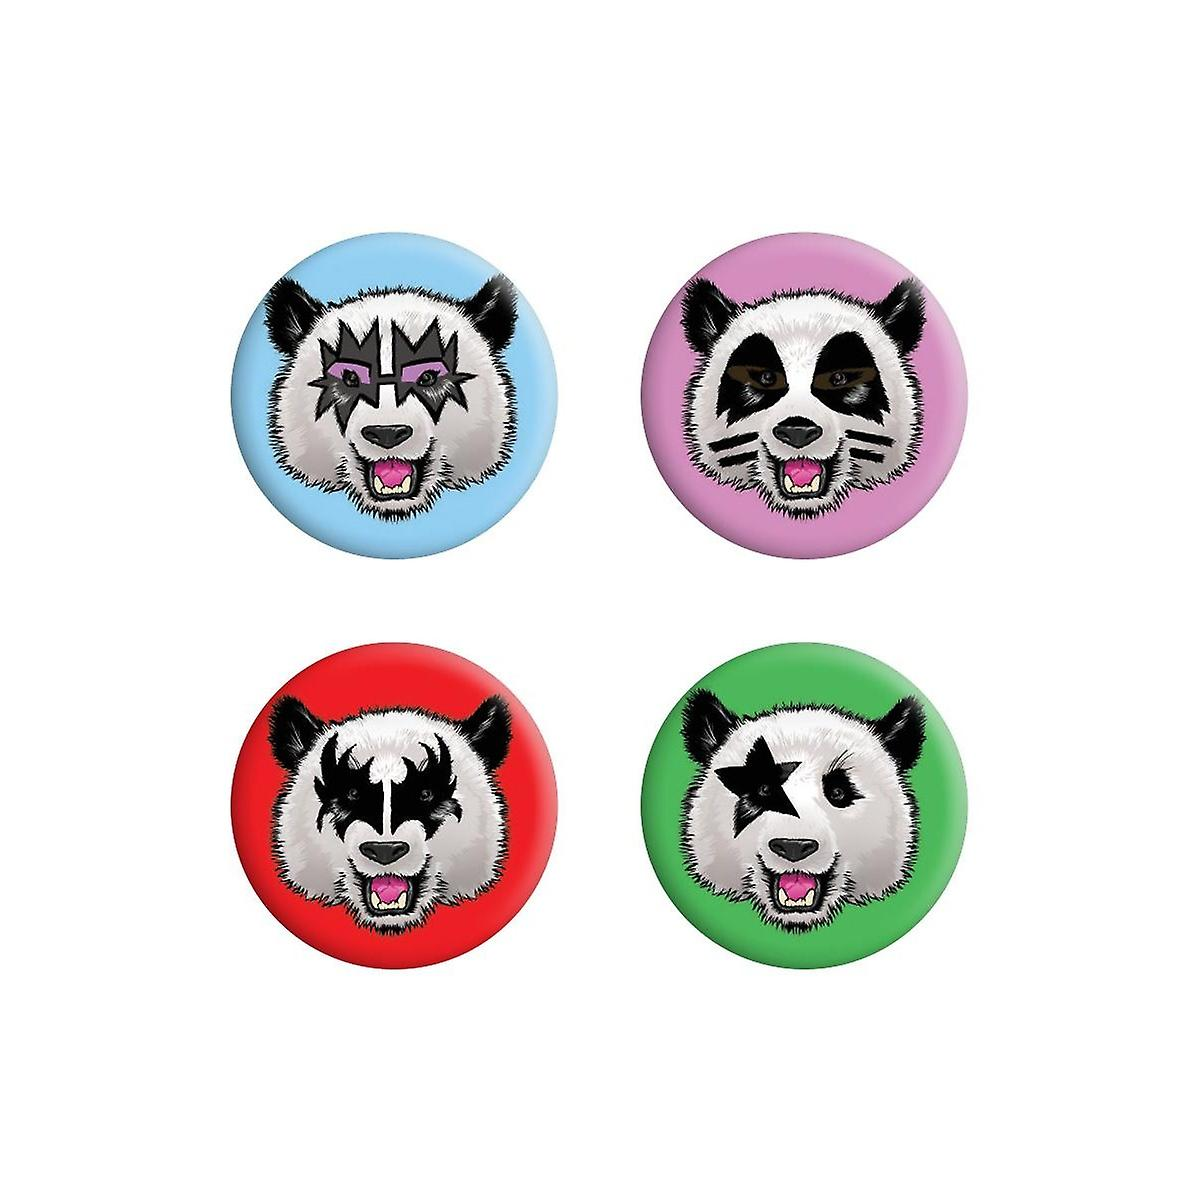 Badge Pandas Grindstore Kiss Badge Grindstore Pandas Pack Kiss TFcJ3ulK51